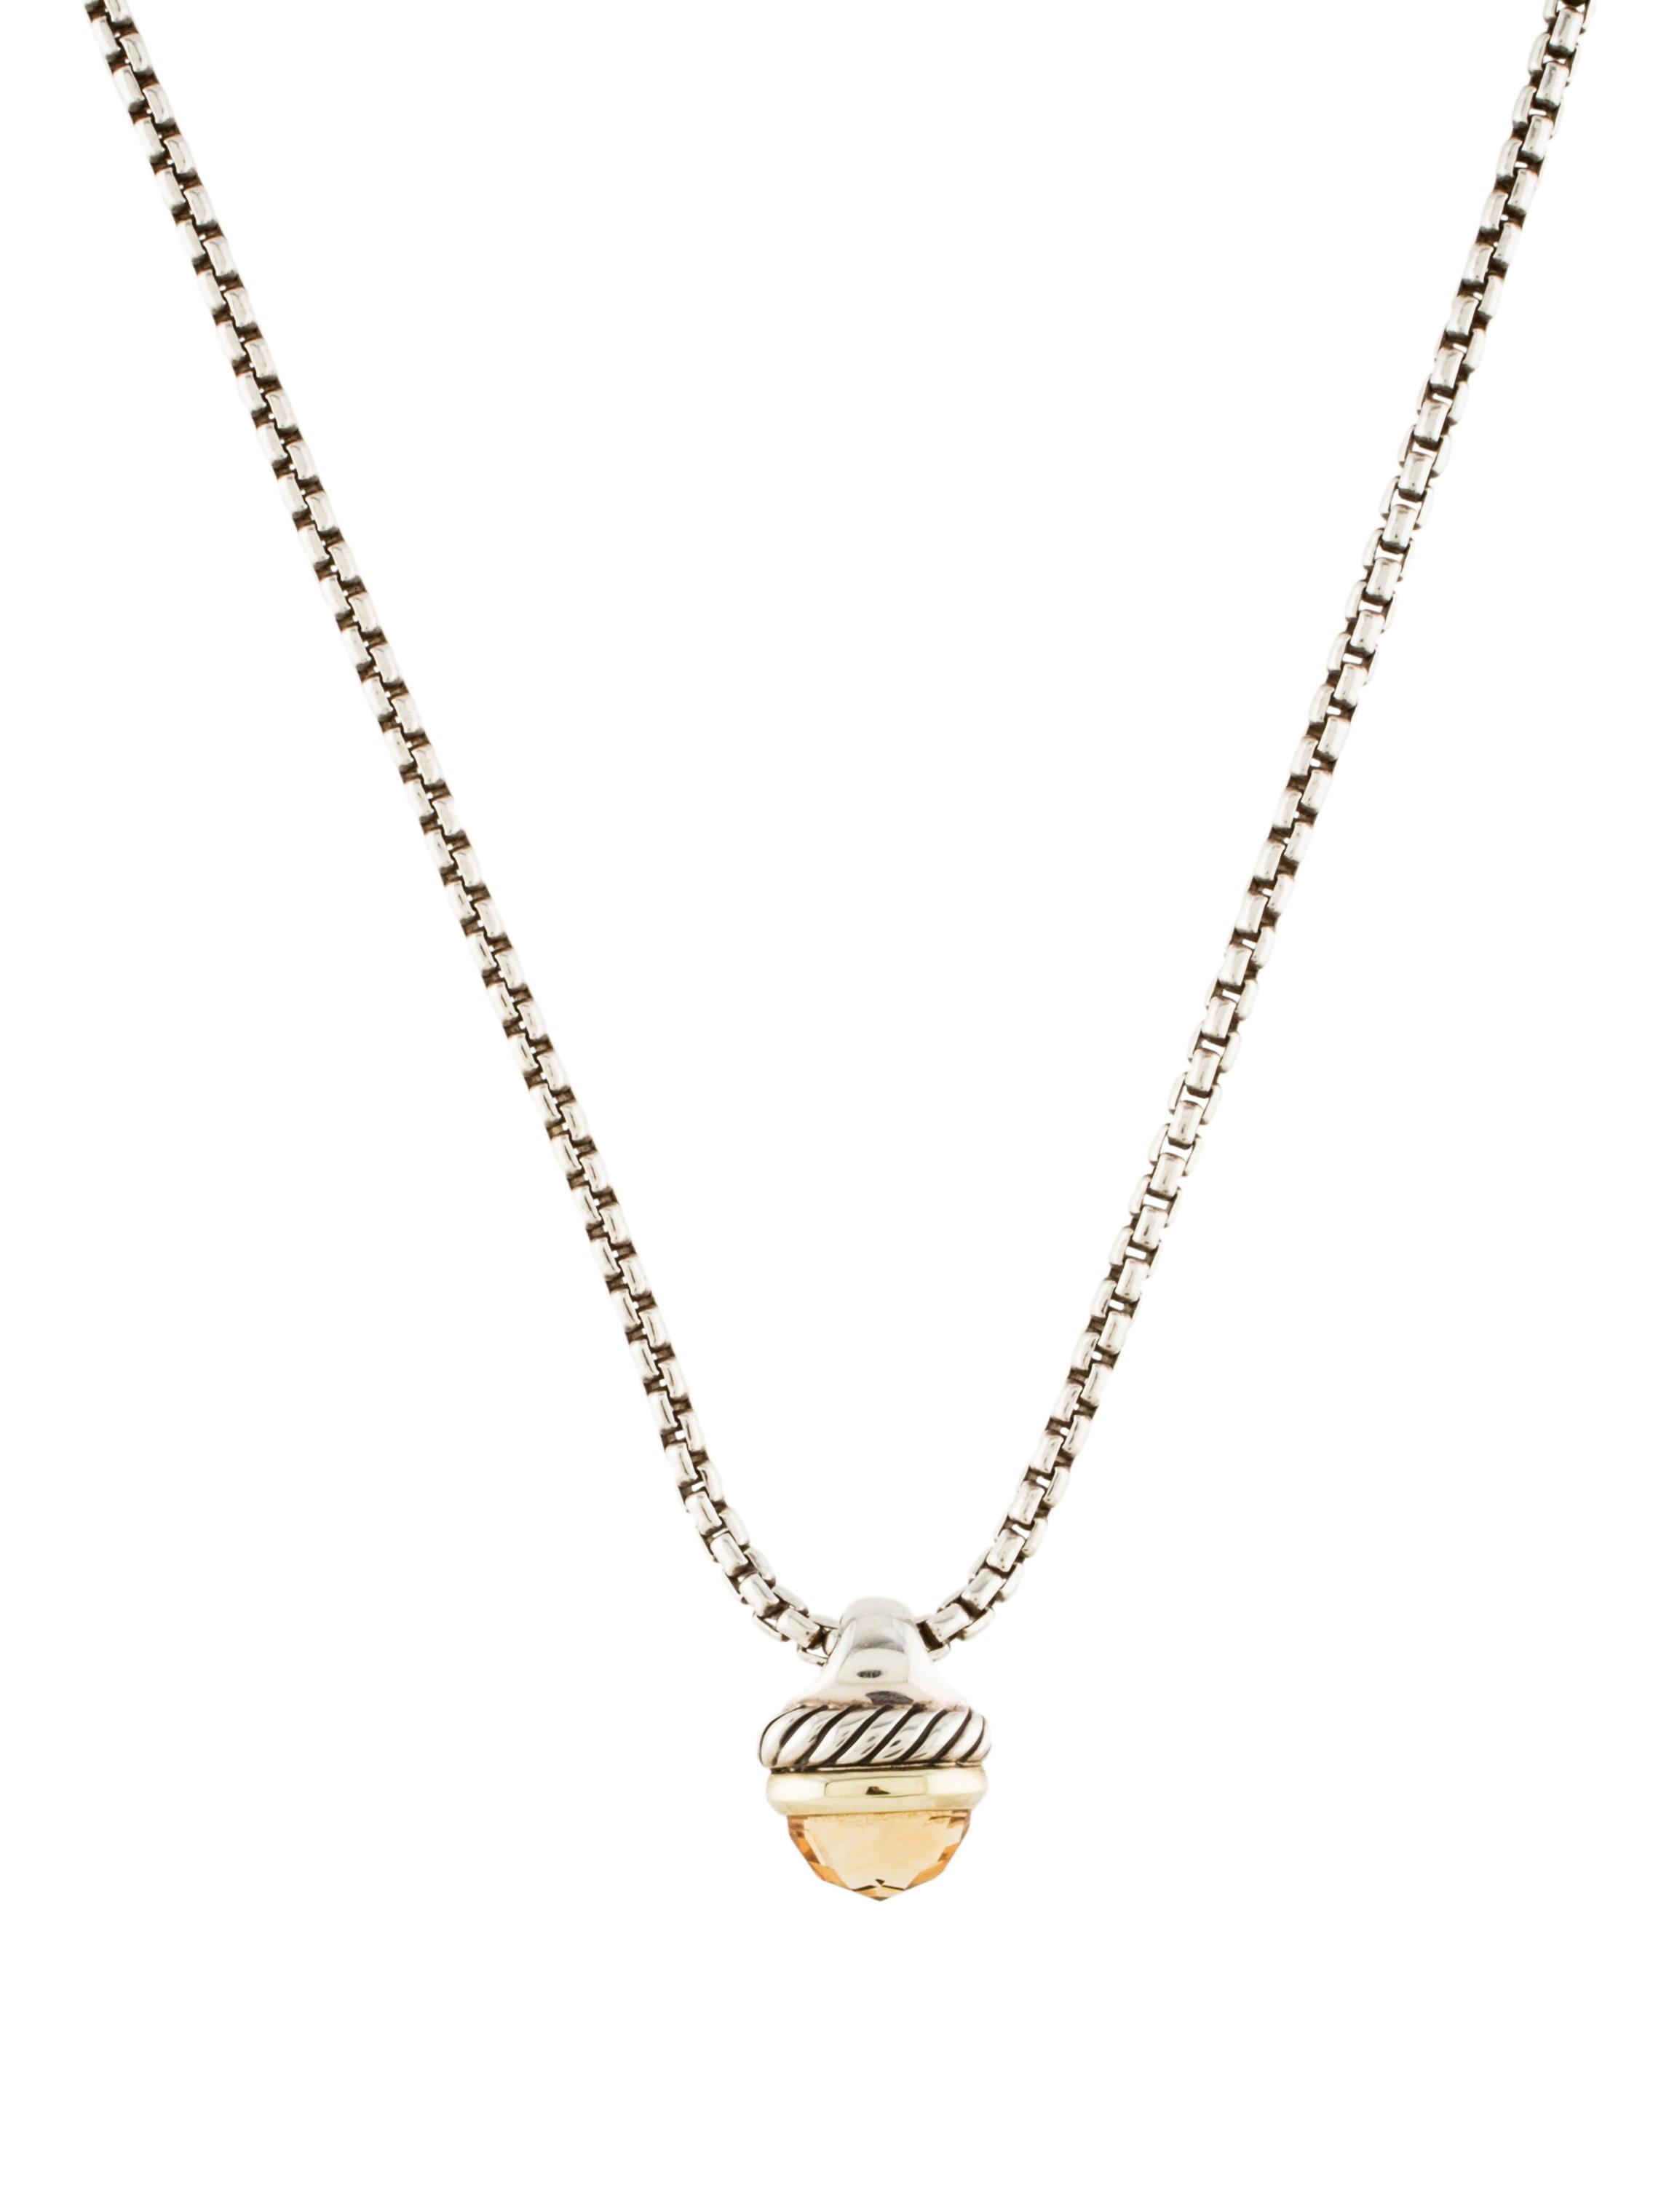 David yurman citrine acorn pendant necklace necklaces dvy38295 citrine acorn pendant necklace mozeypictures Image collections